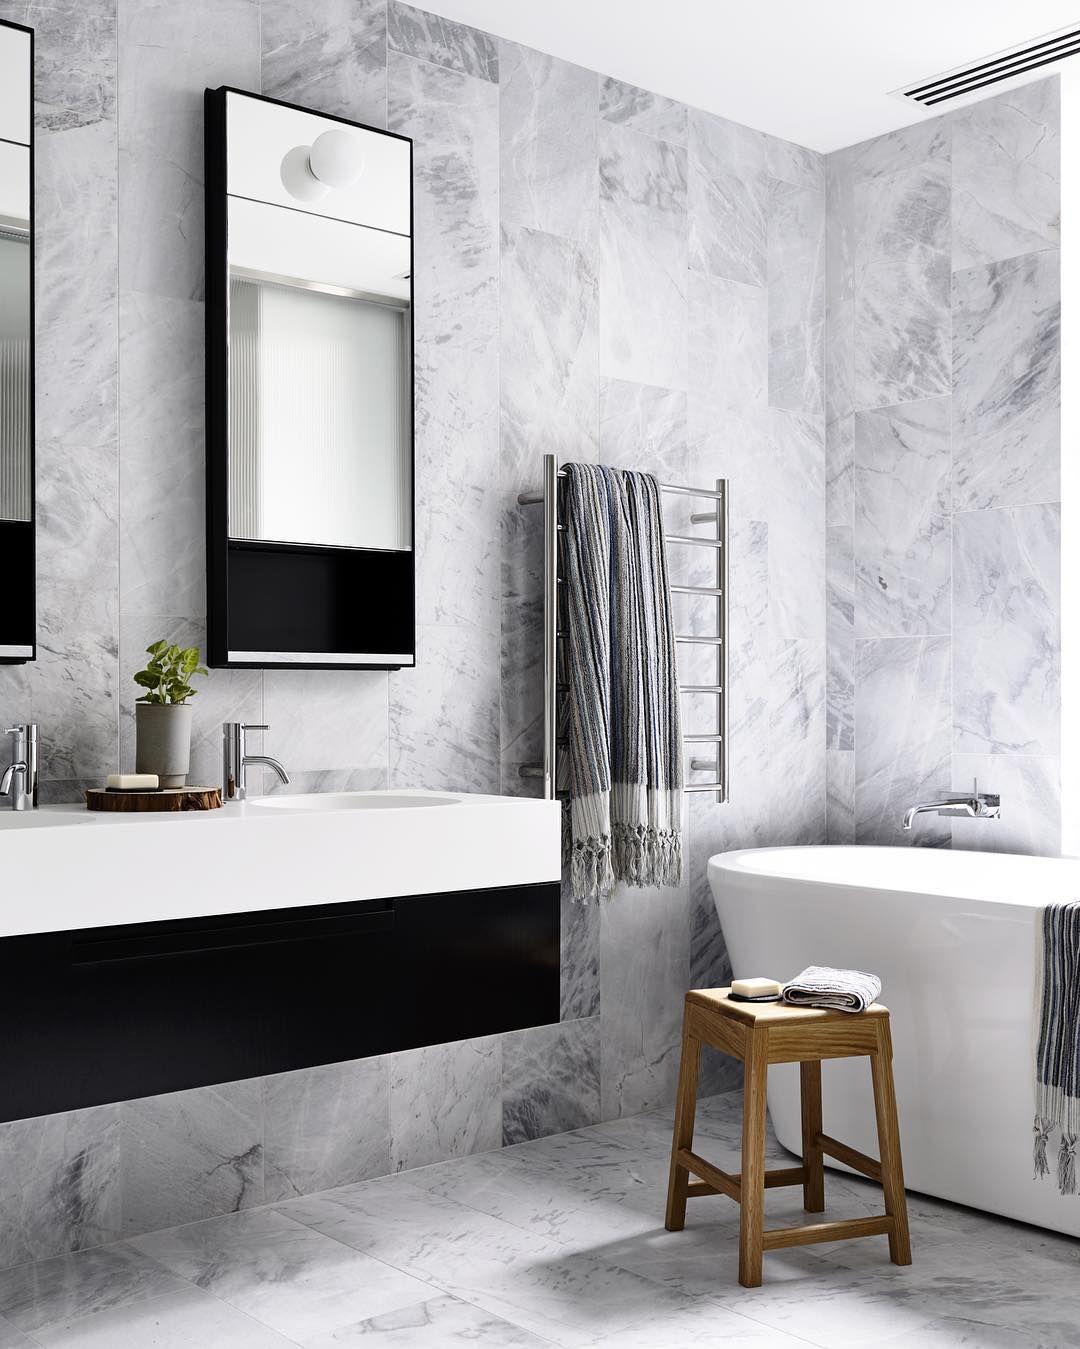 interiordesign #decor #TODesign via adesignersmind | bathroom ...